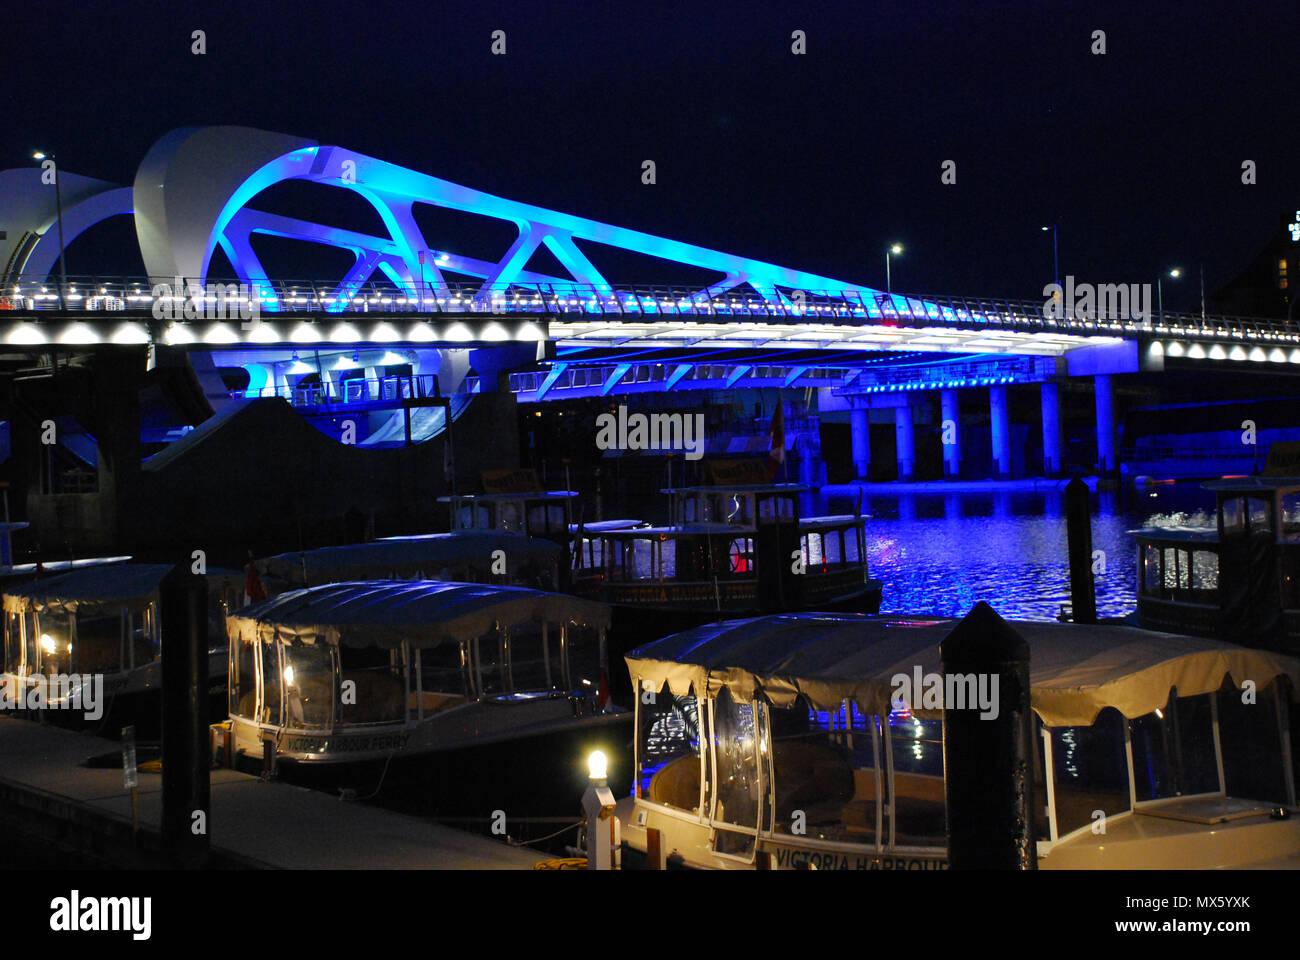 Johnson Street Bridge, Victoria, BC Canada Stock Photo